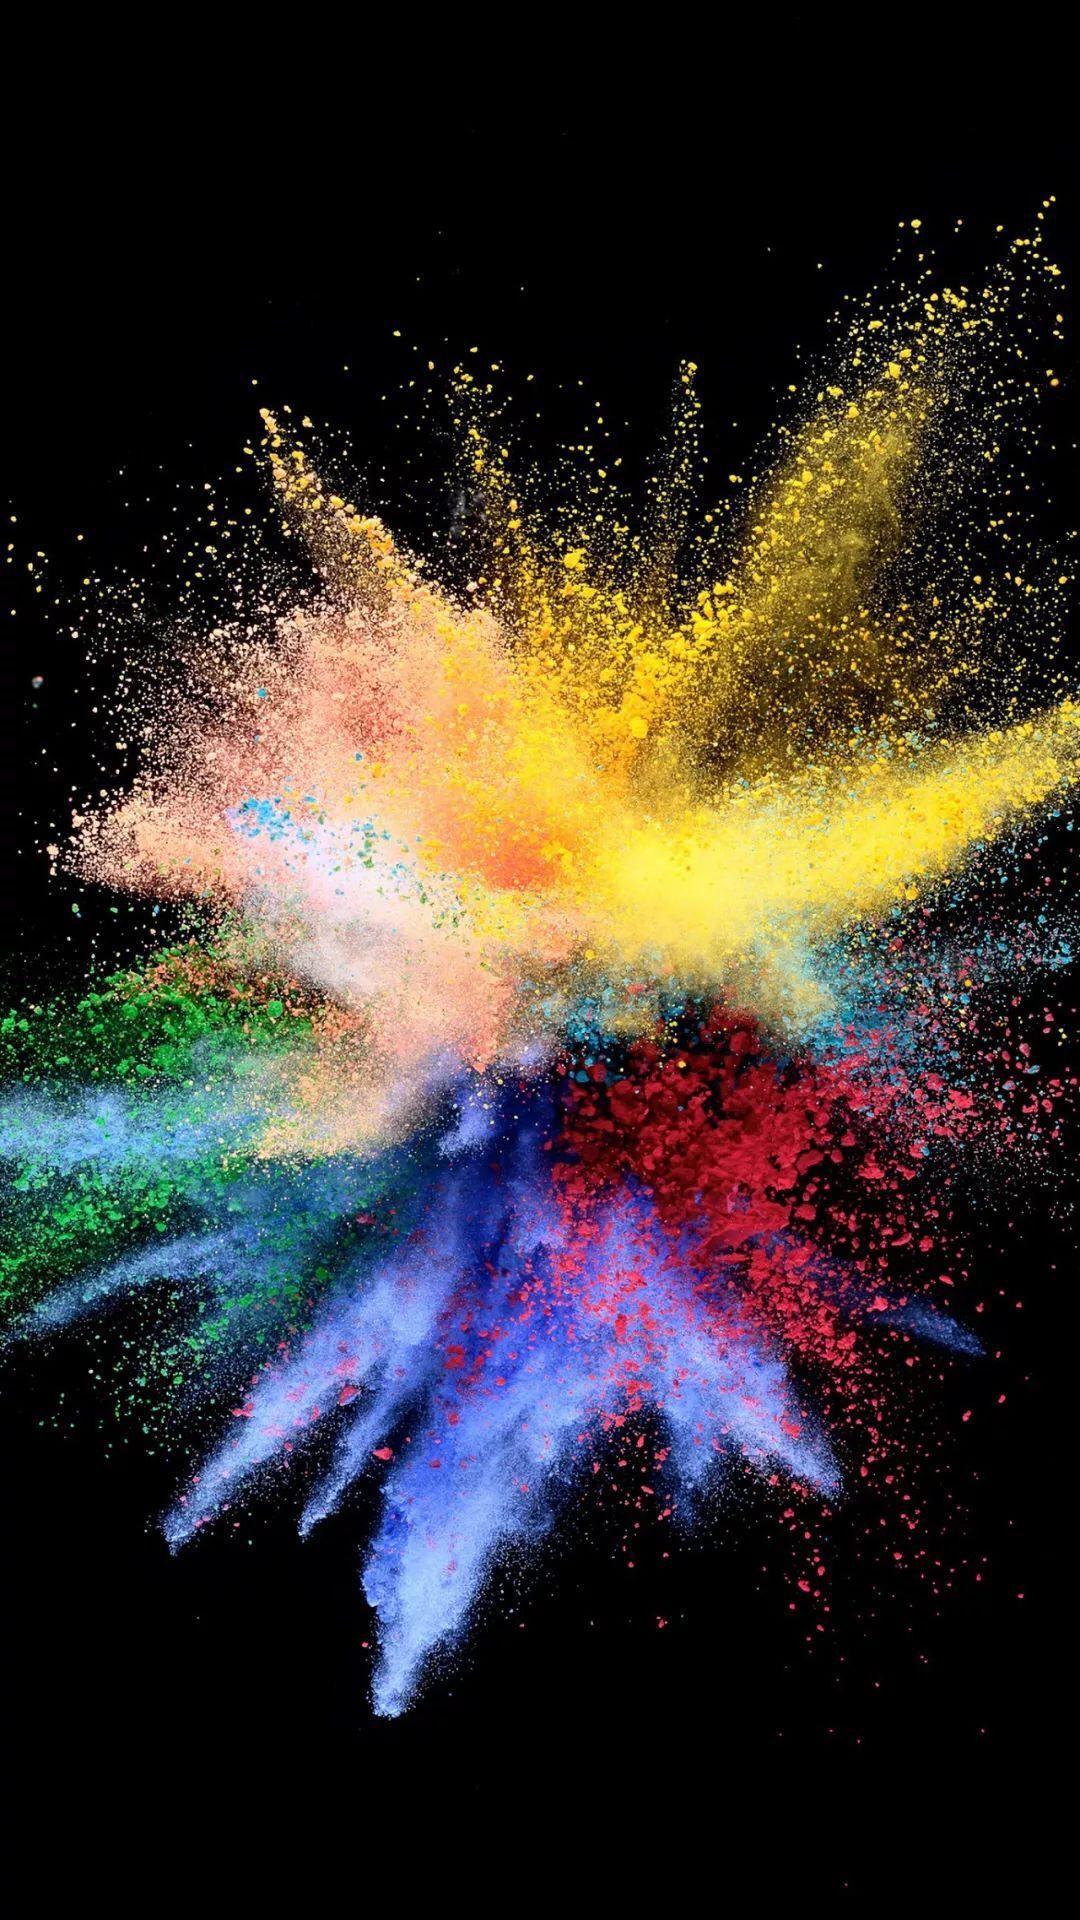 Color Burst Bright Colors Explosion Imagination Https Imaginationrevelation Com Art Wallpaper Iphone Cellphone Wallpaper Live Wallpaper Iphone